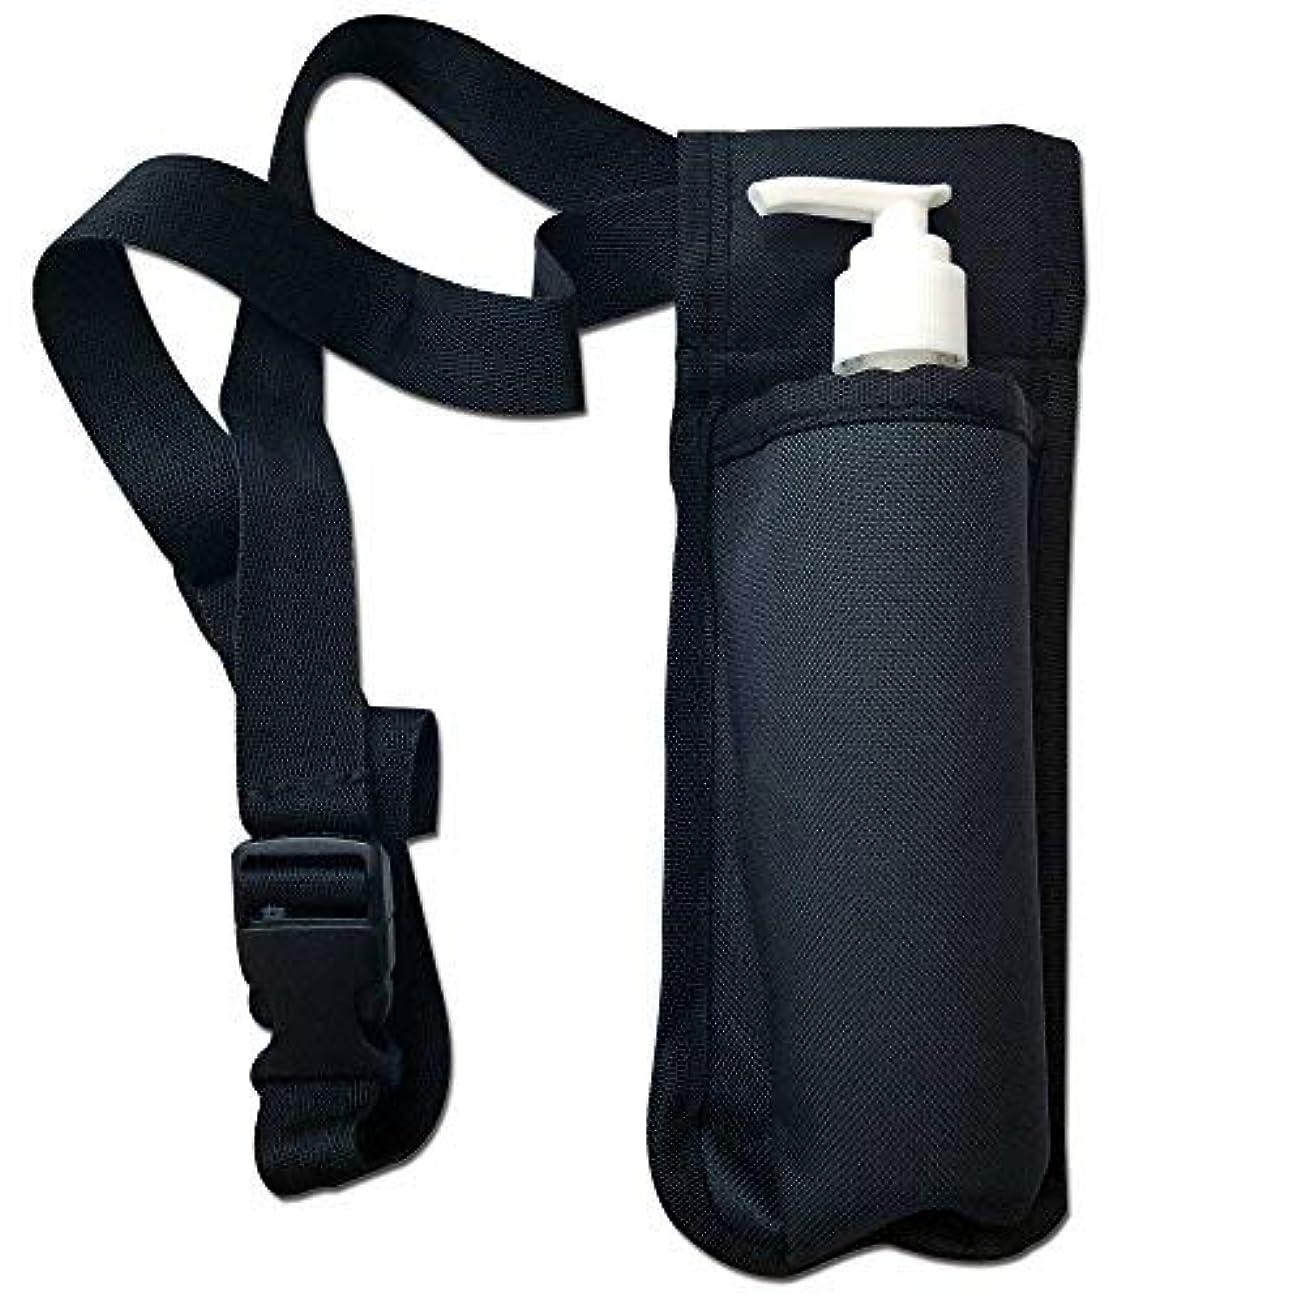 TOA Single Bottle Holster Adjustable Strap w/ 6oz Bottle for Massage Oil, Lotion, Cream [並行輸入品]